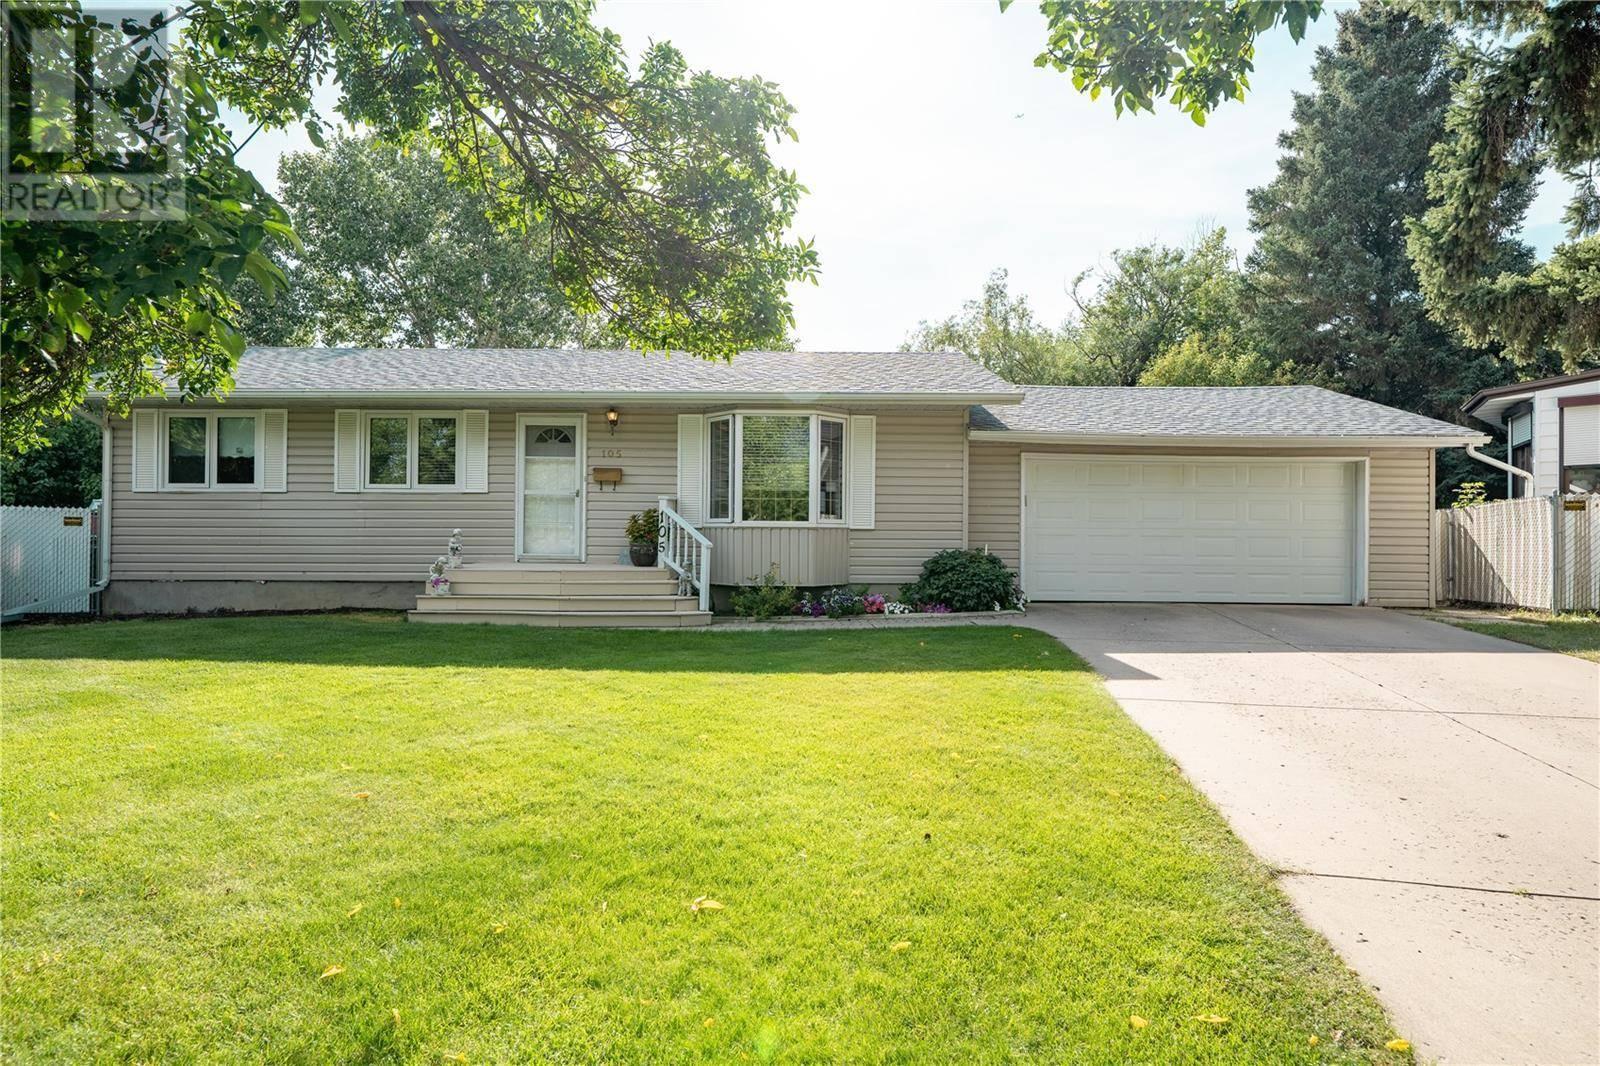 House for sale at 105 Mcmaster Cres Saskatoon Saskatchewan - MLS: SK784223